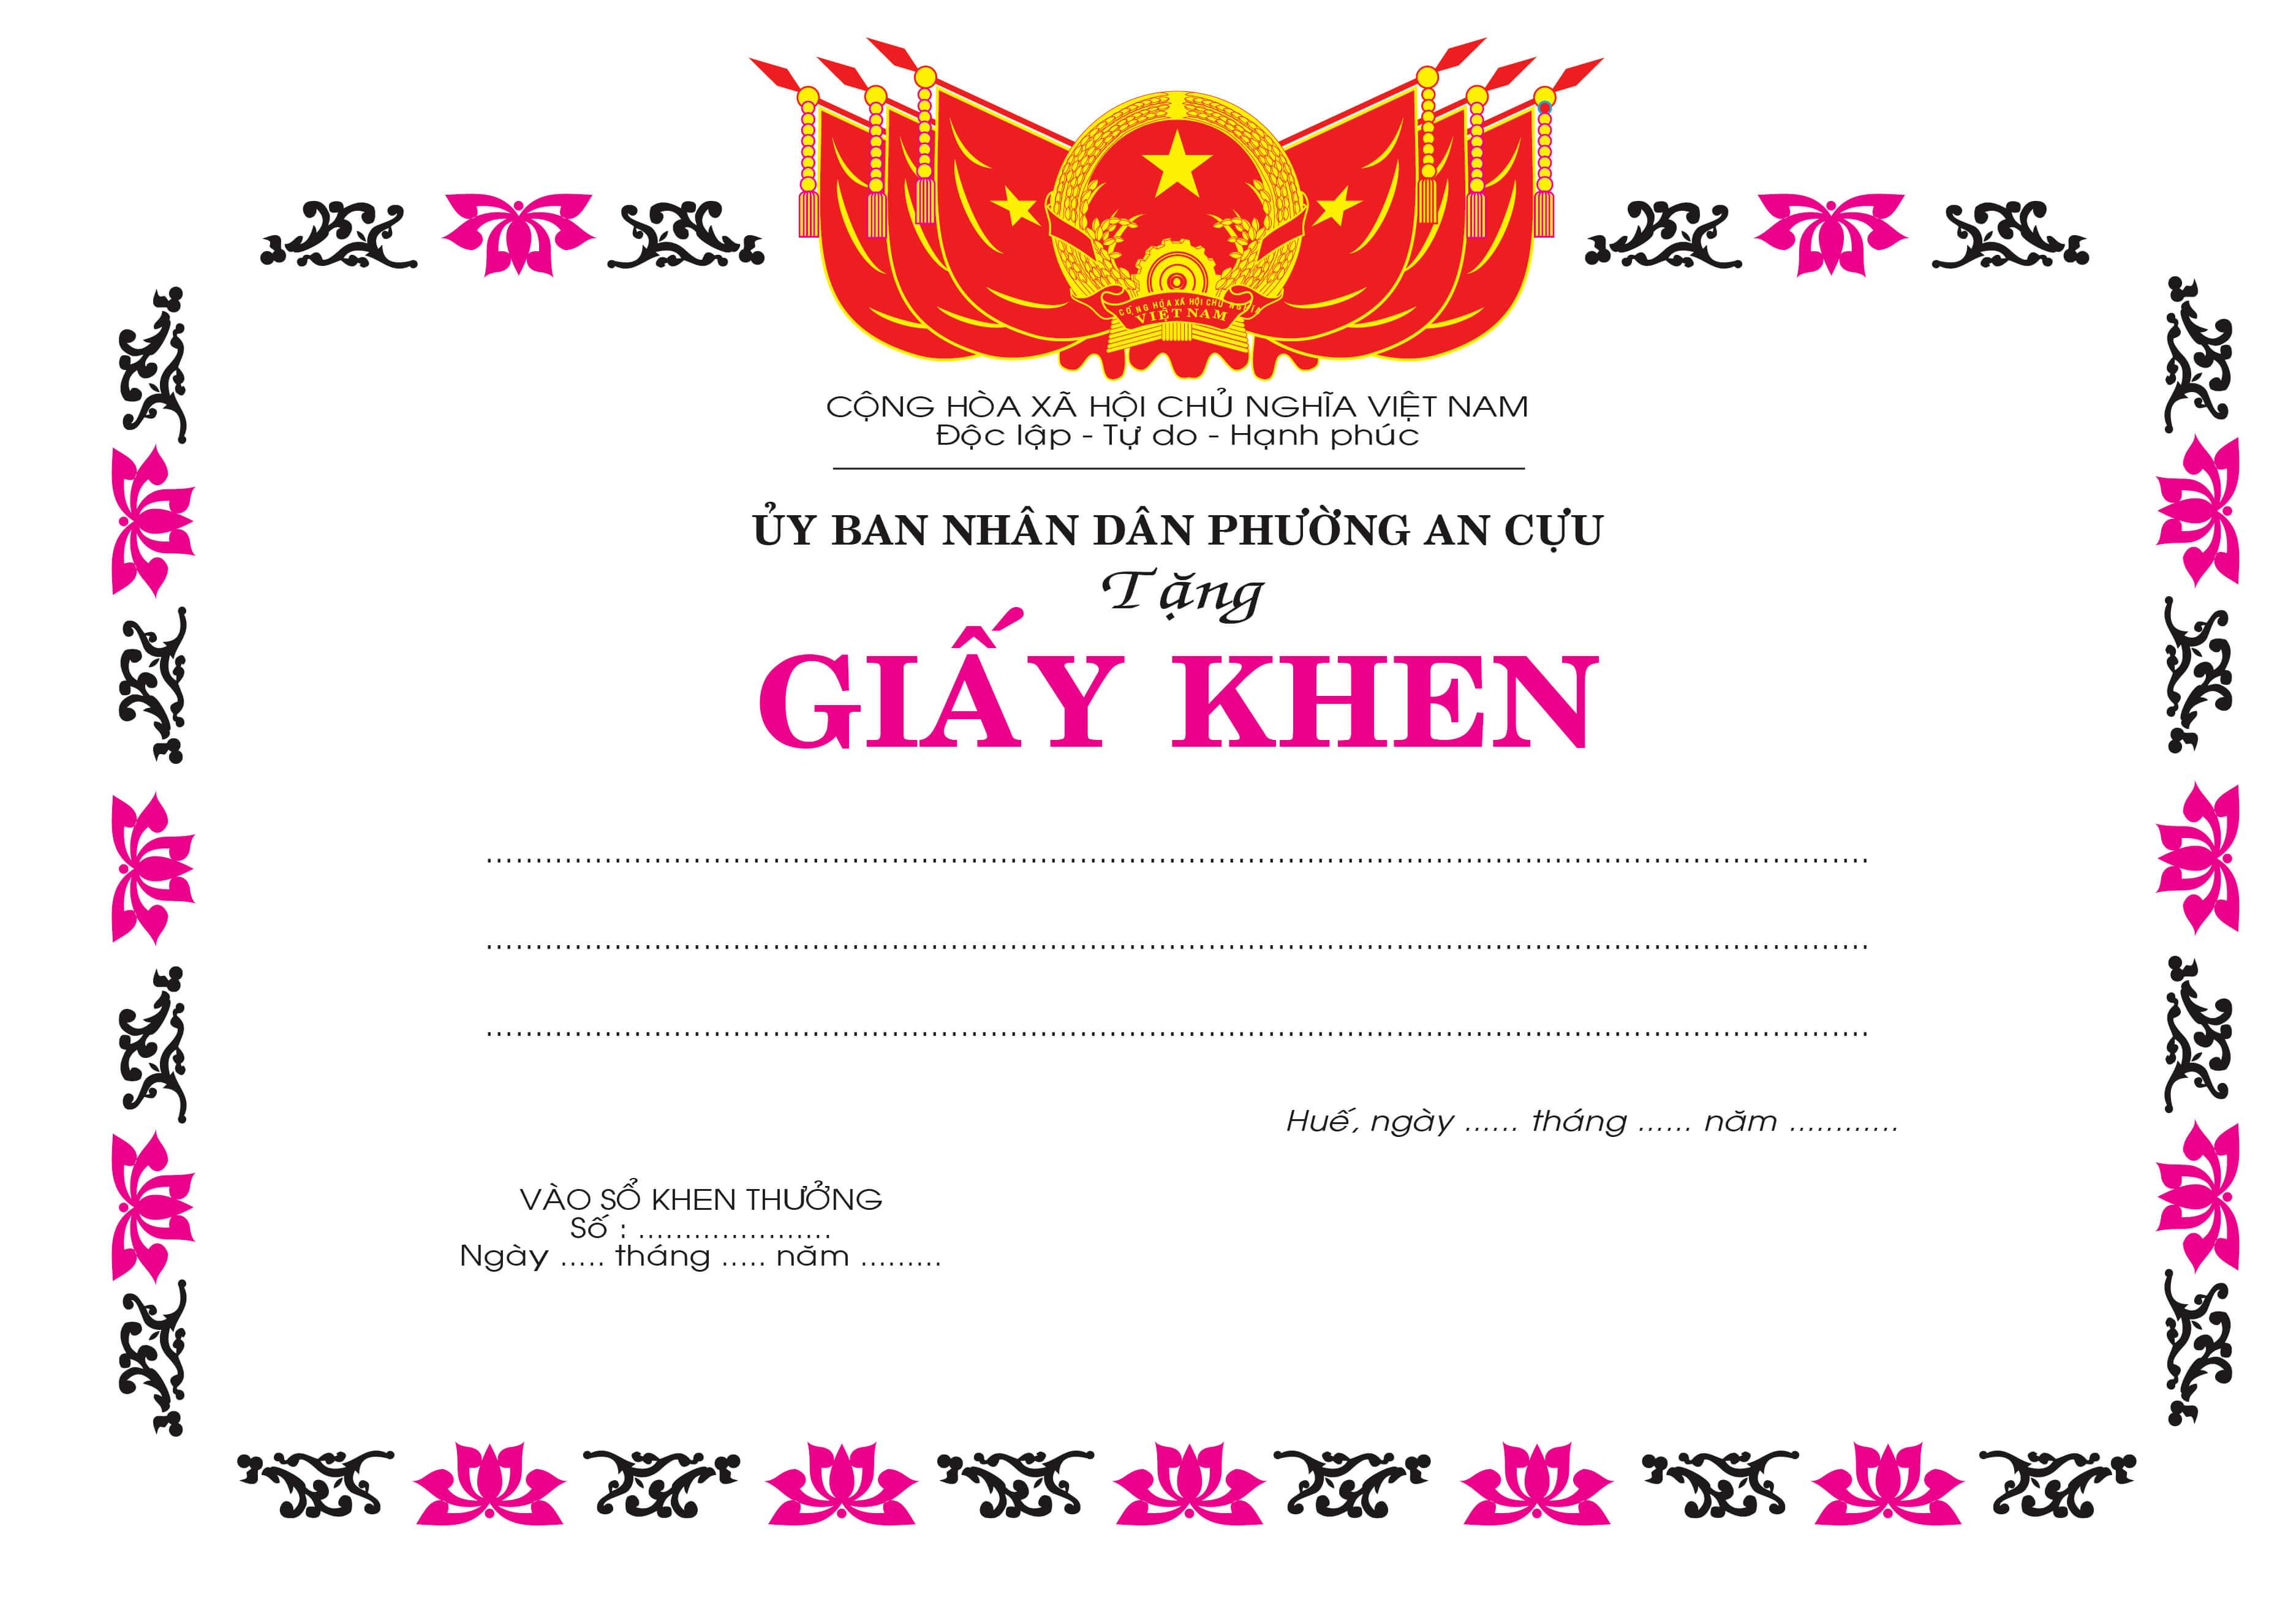 Mẫu giấy khen 052 - Mẫu giấy khen ủy ban phường - link download : https://adsnew.net/06uvwo